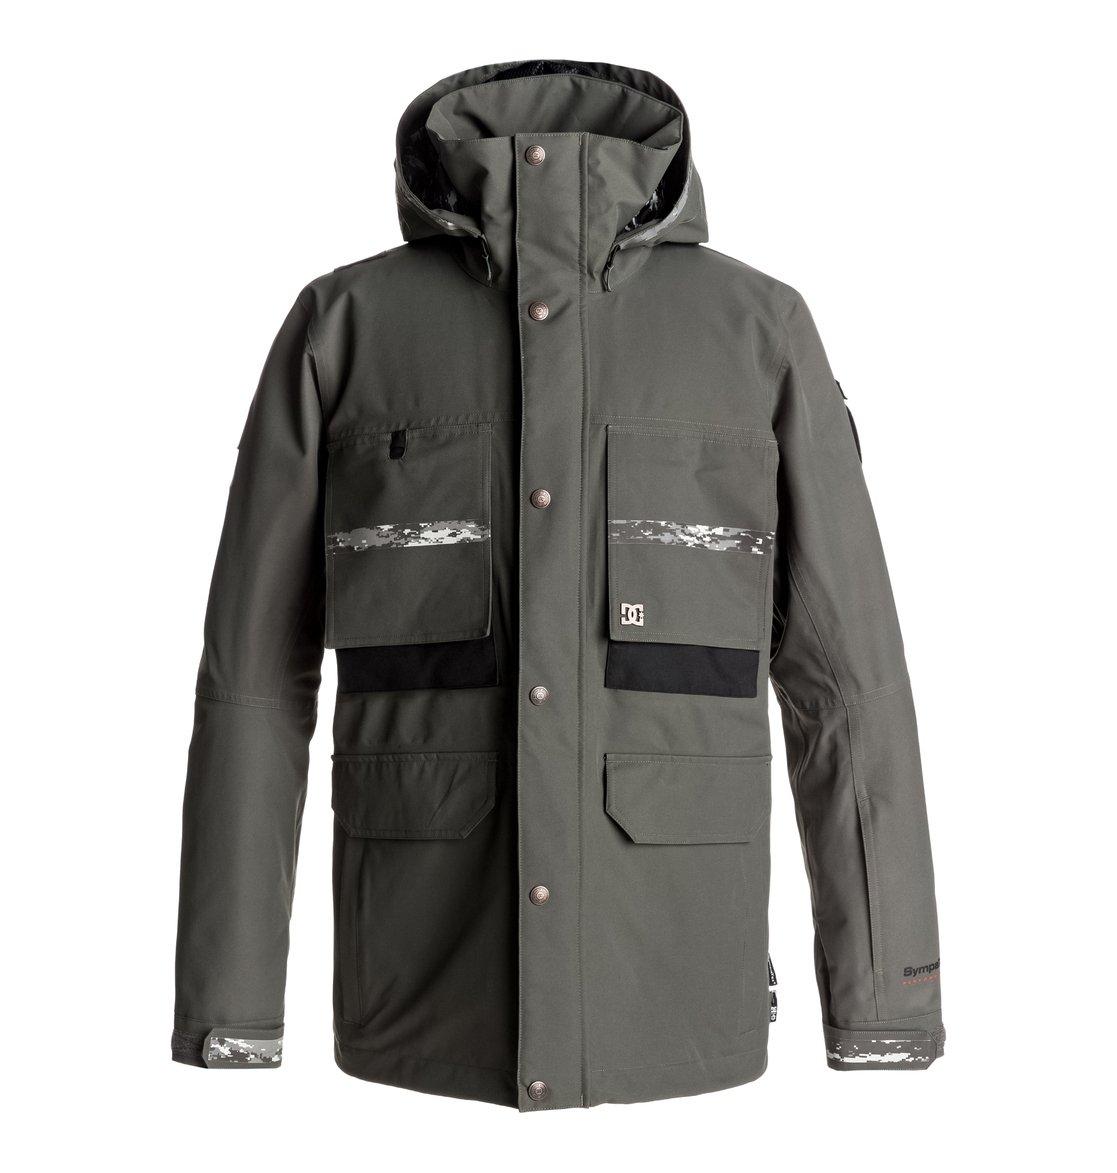 Сноубордическая куртка Company SPT от DC Shoes